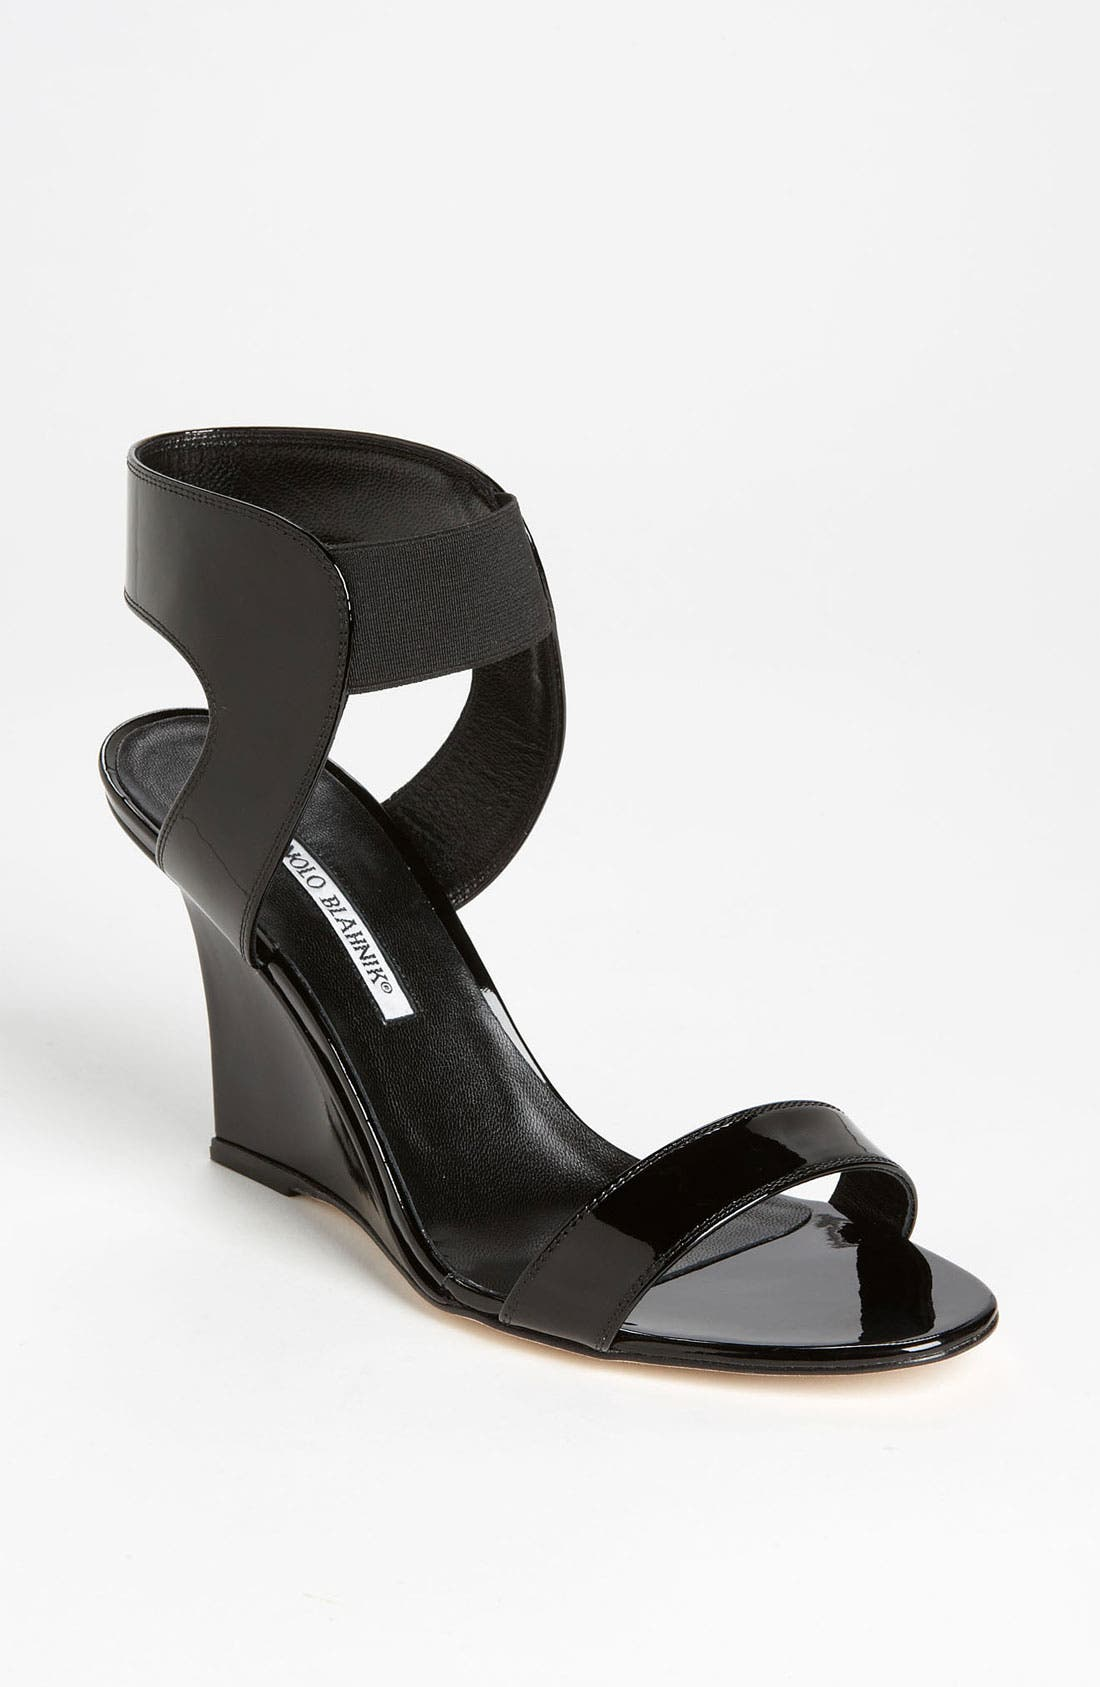 Main Image - Manolo Blahnik 'Pepe' Wedge Sandal